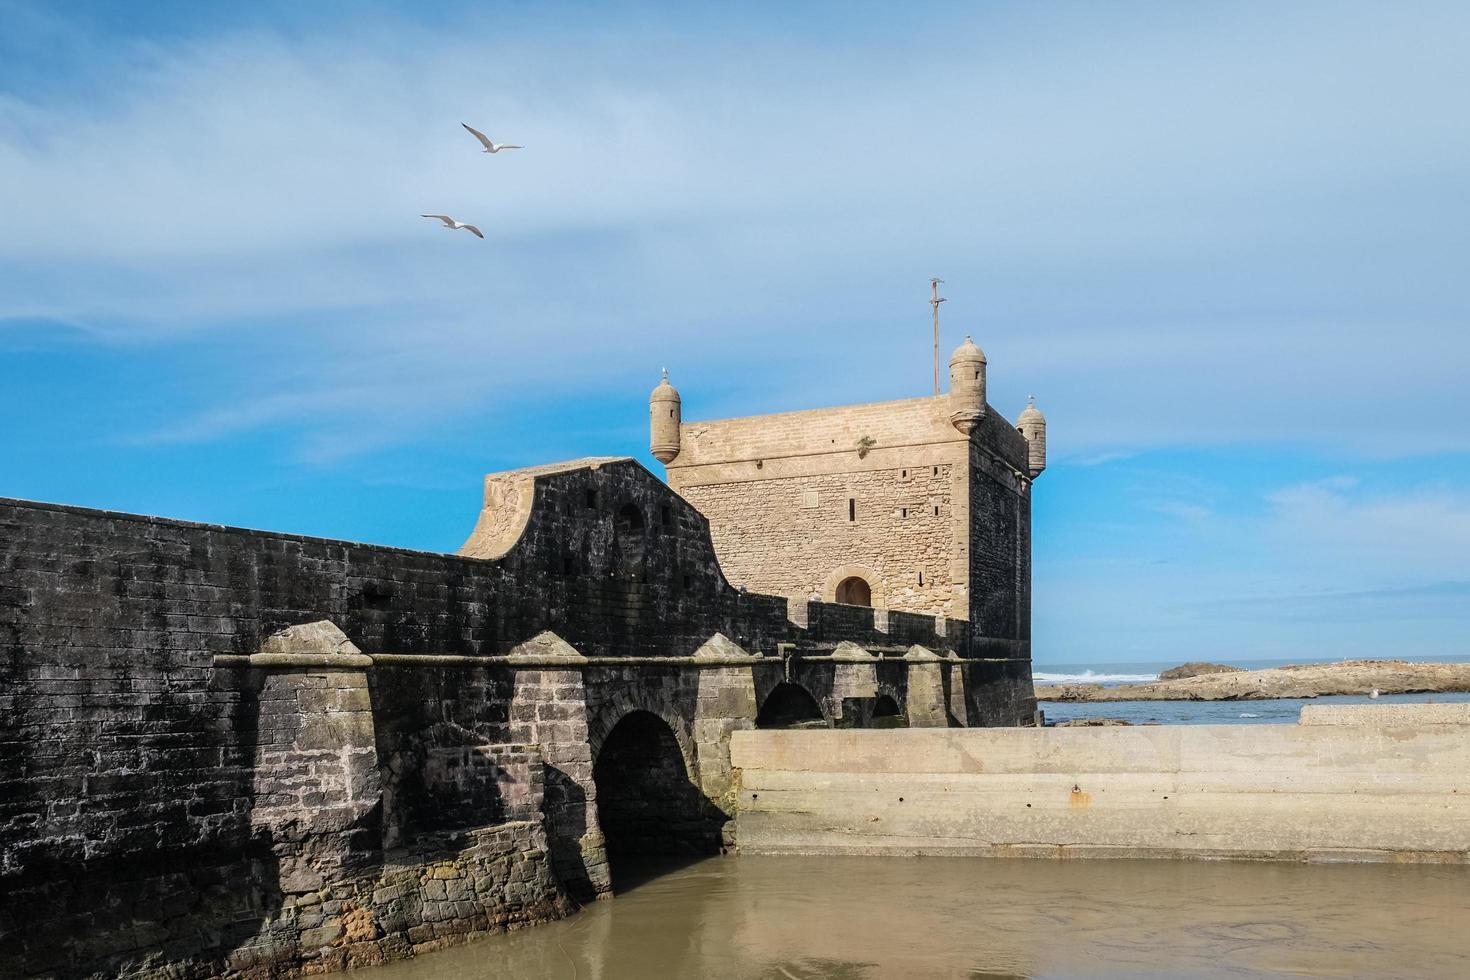 essaouira citadell nära Atlanten foto